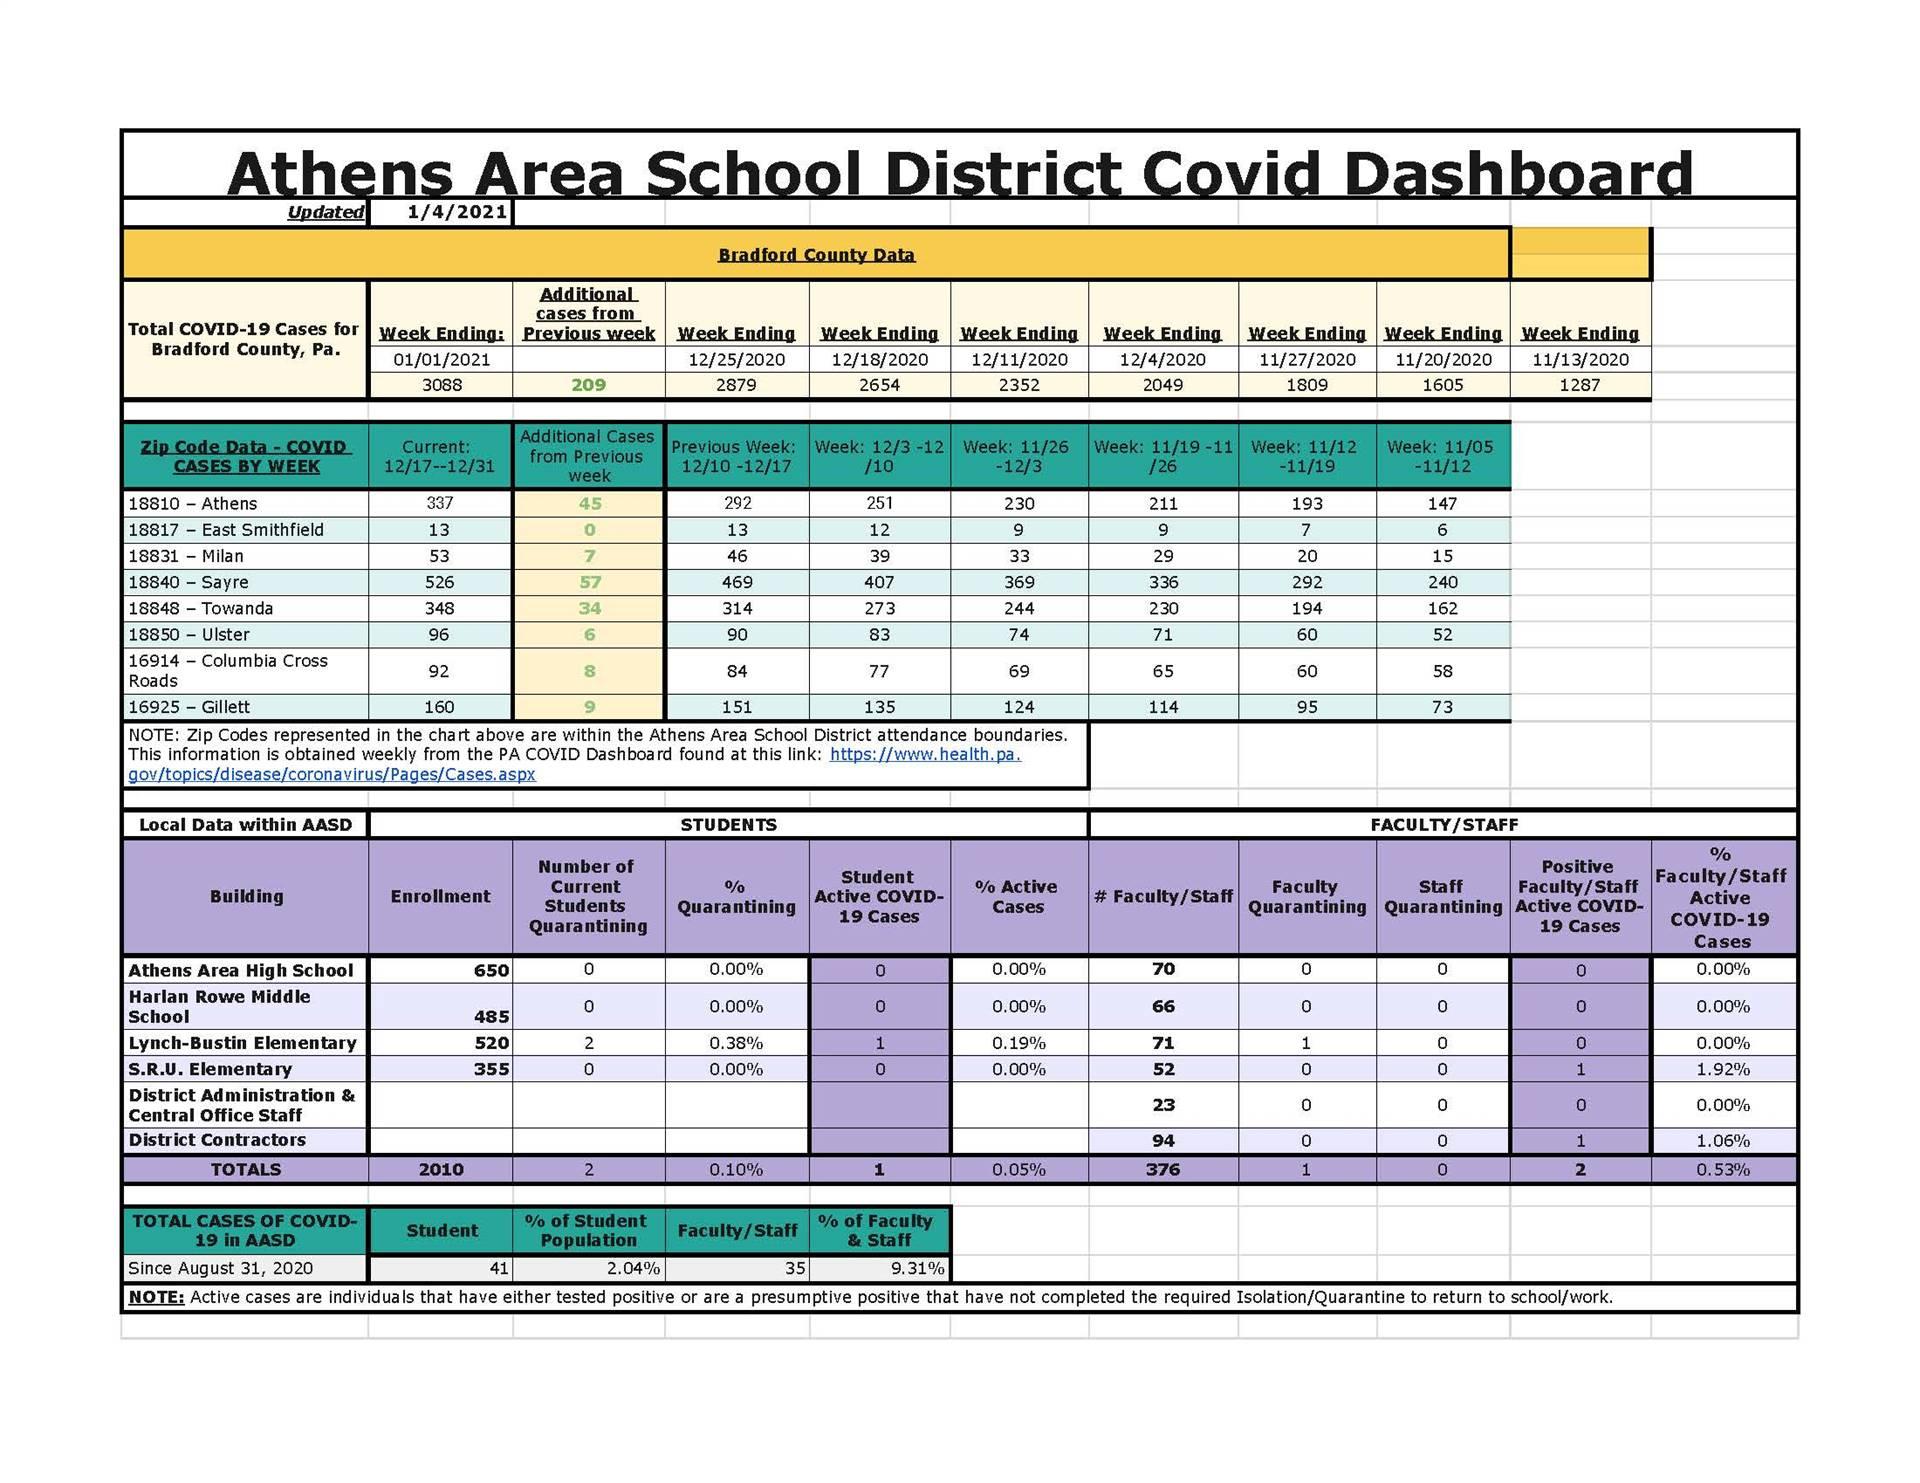 AASD COVID Dashboard 01.04.2021